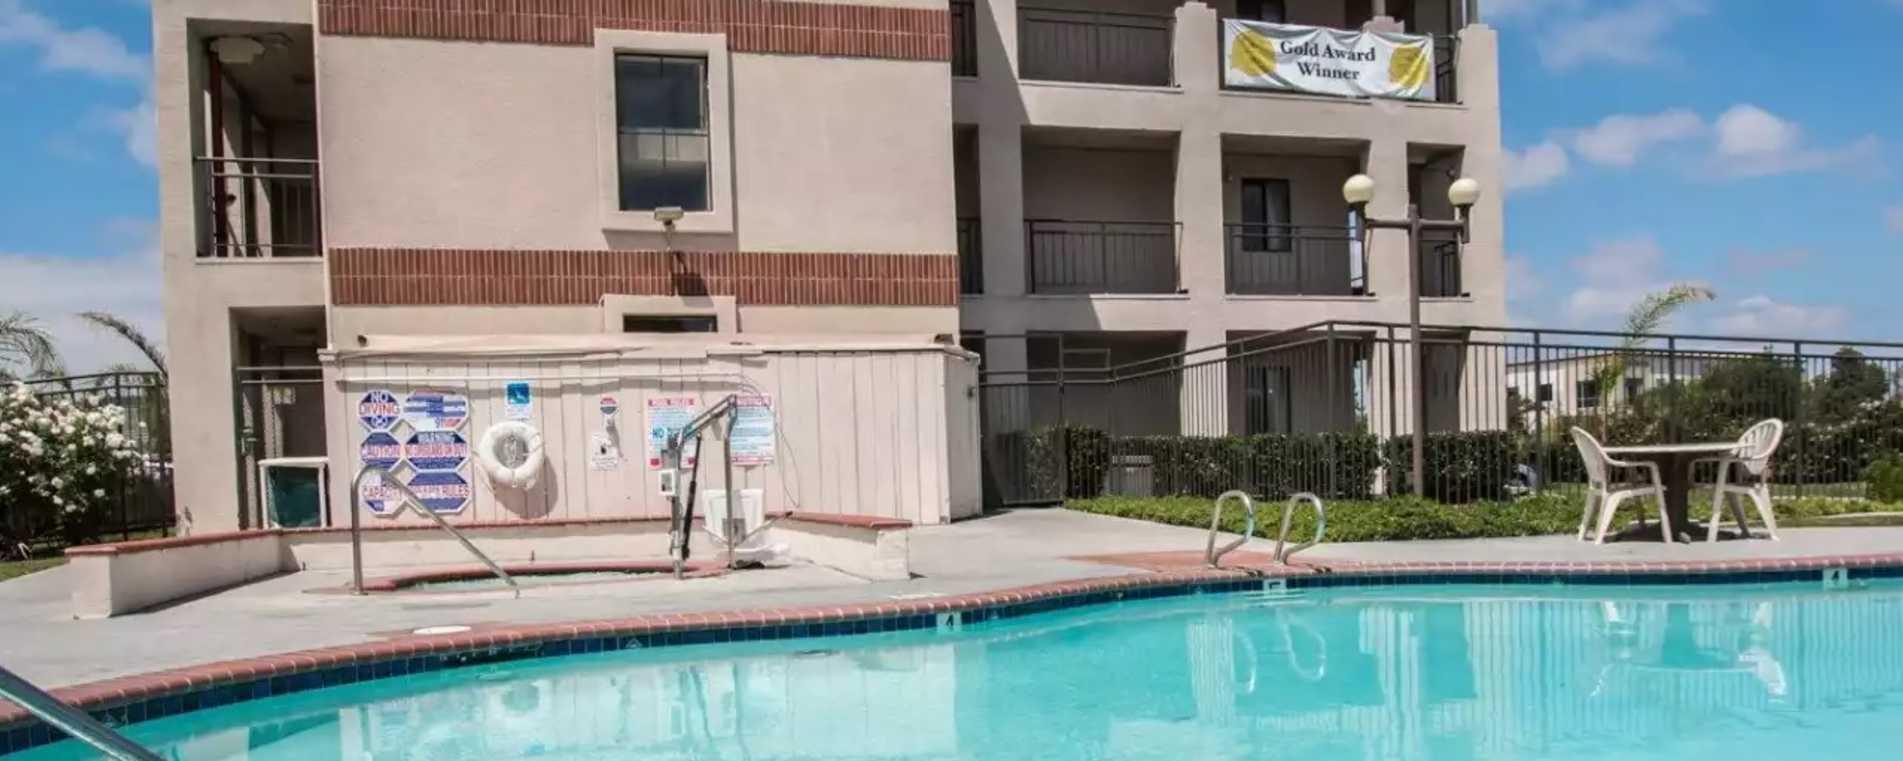 Quality Inn Pool Side